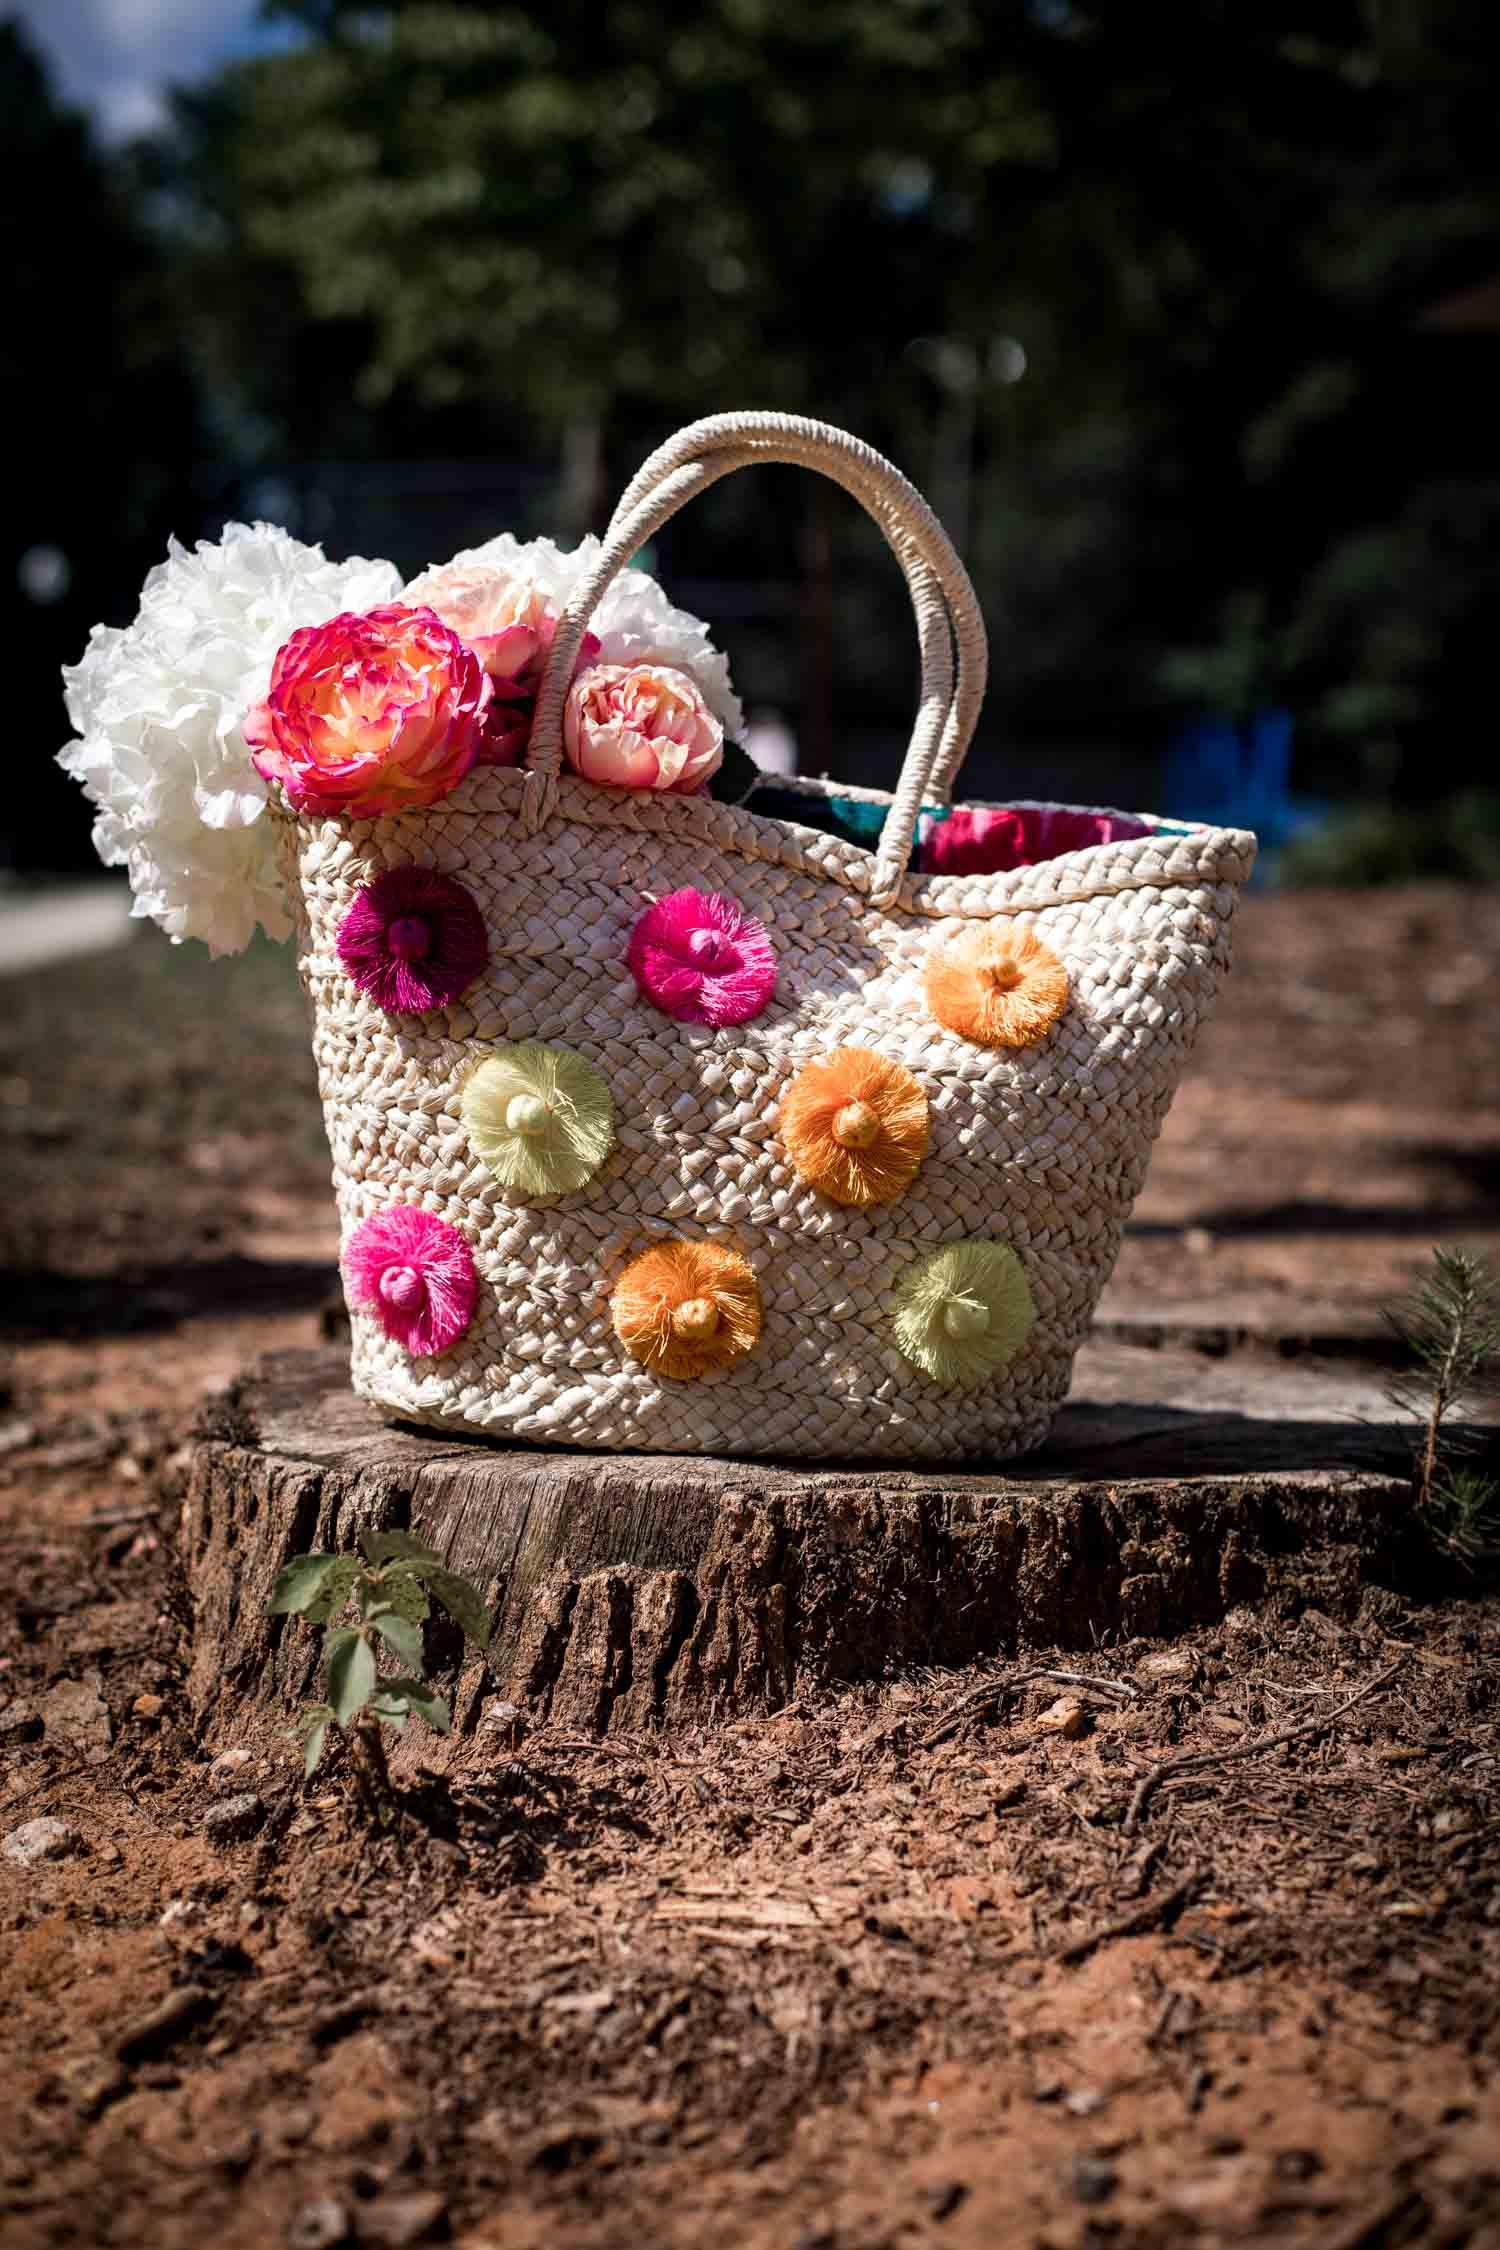 affordable and stylish straw bag styled by fashion and lifestyle blogger Monica Awe-Etuk